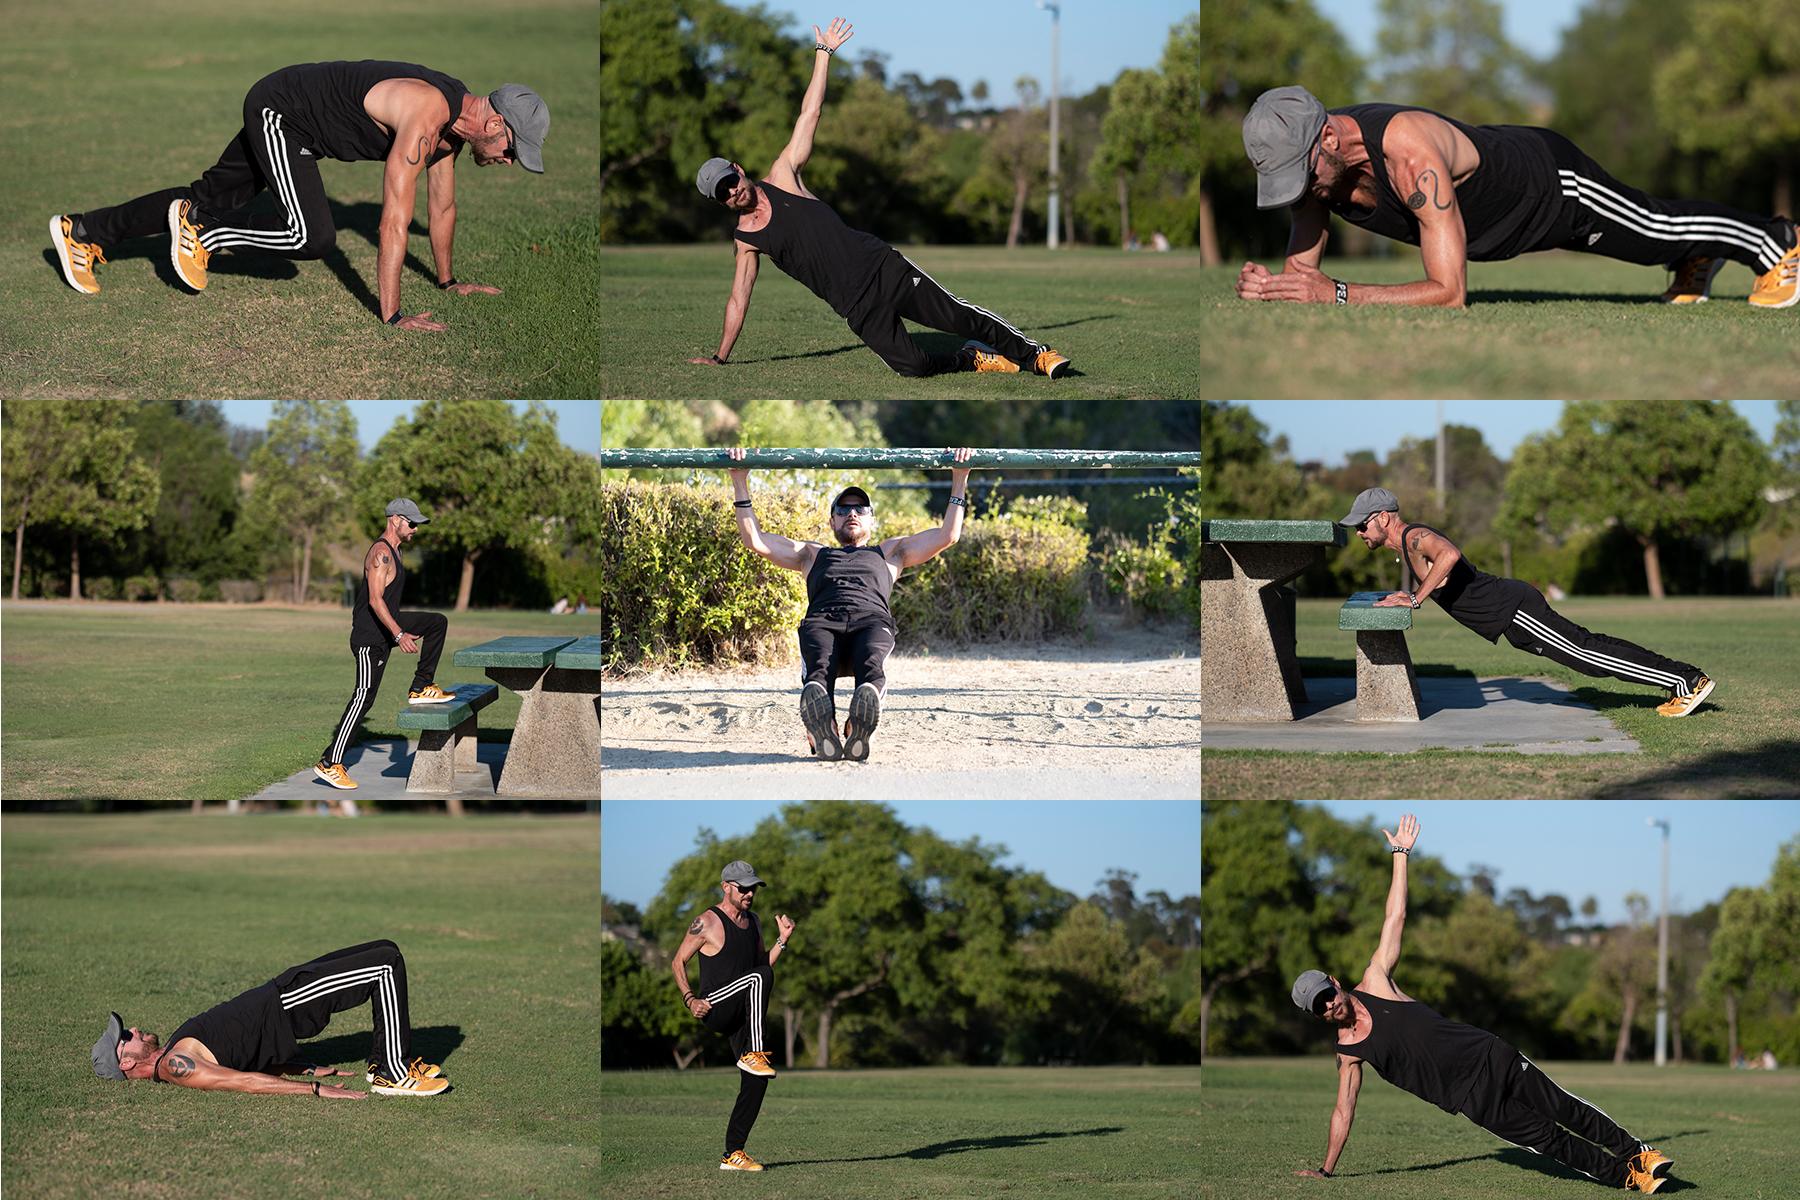 Barry's Park or Backyard Workout